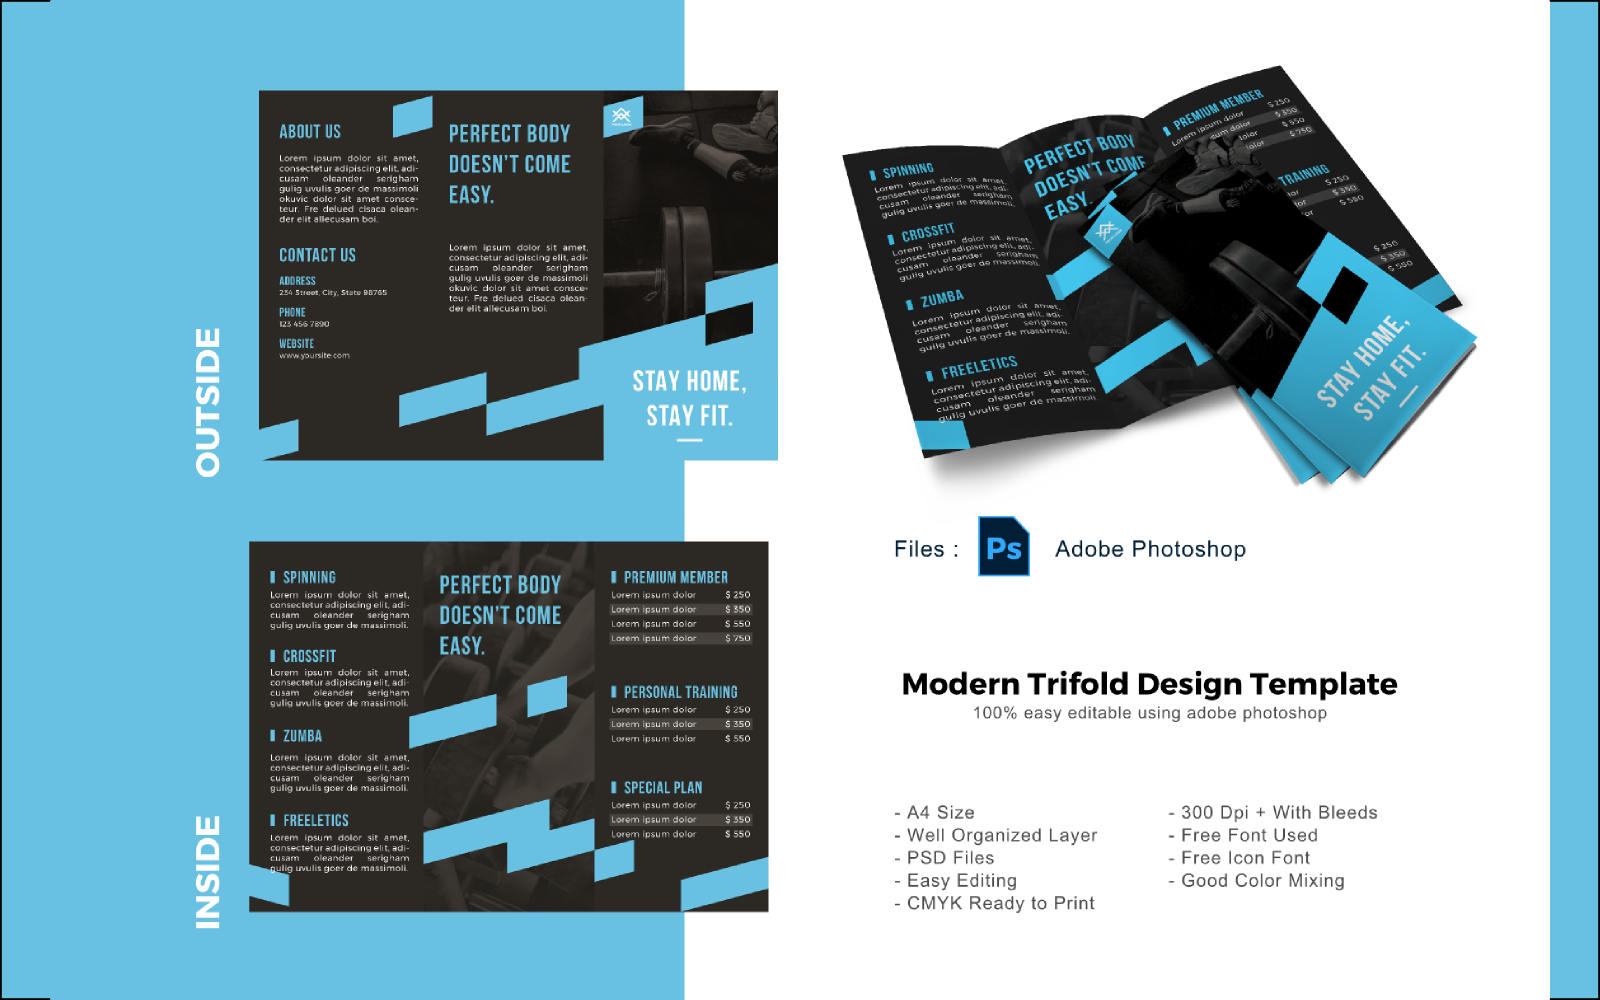 Fitbody Trifold Brochure PSD sablon 150213